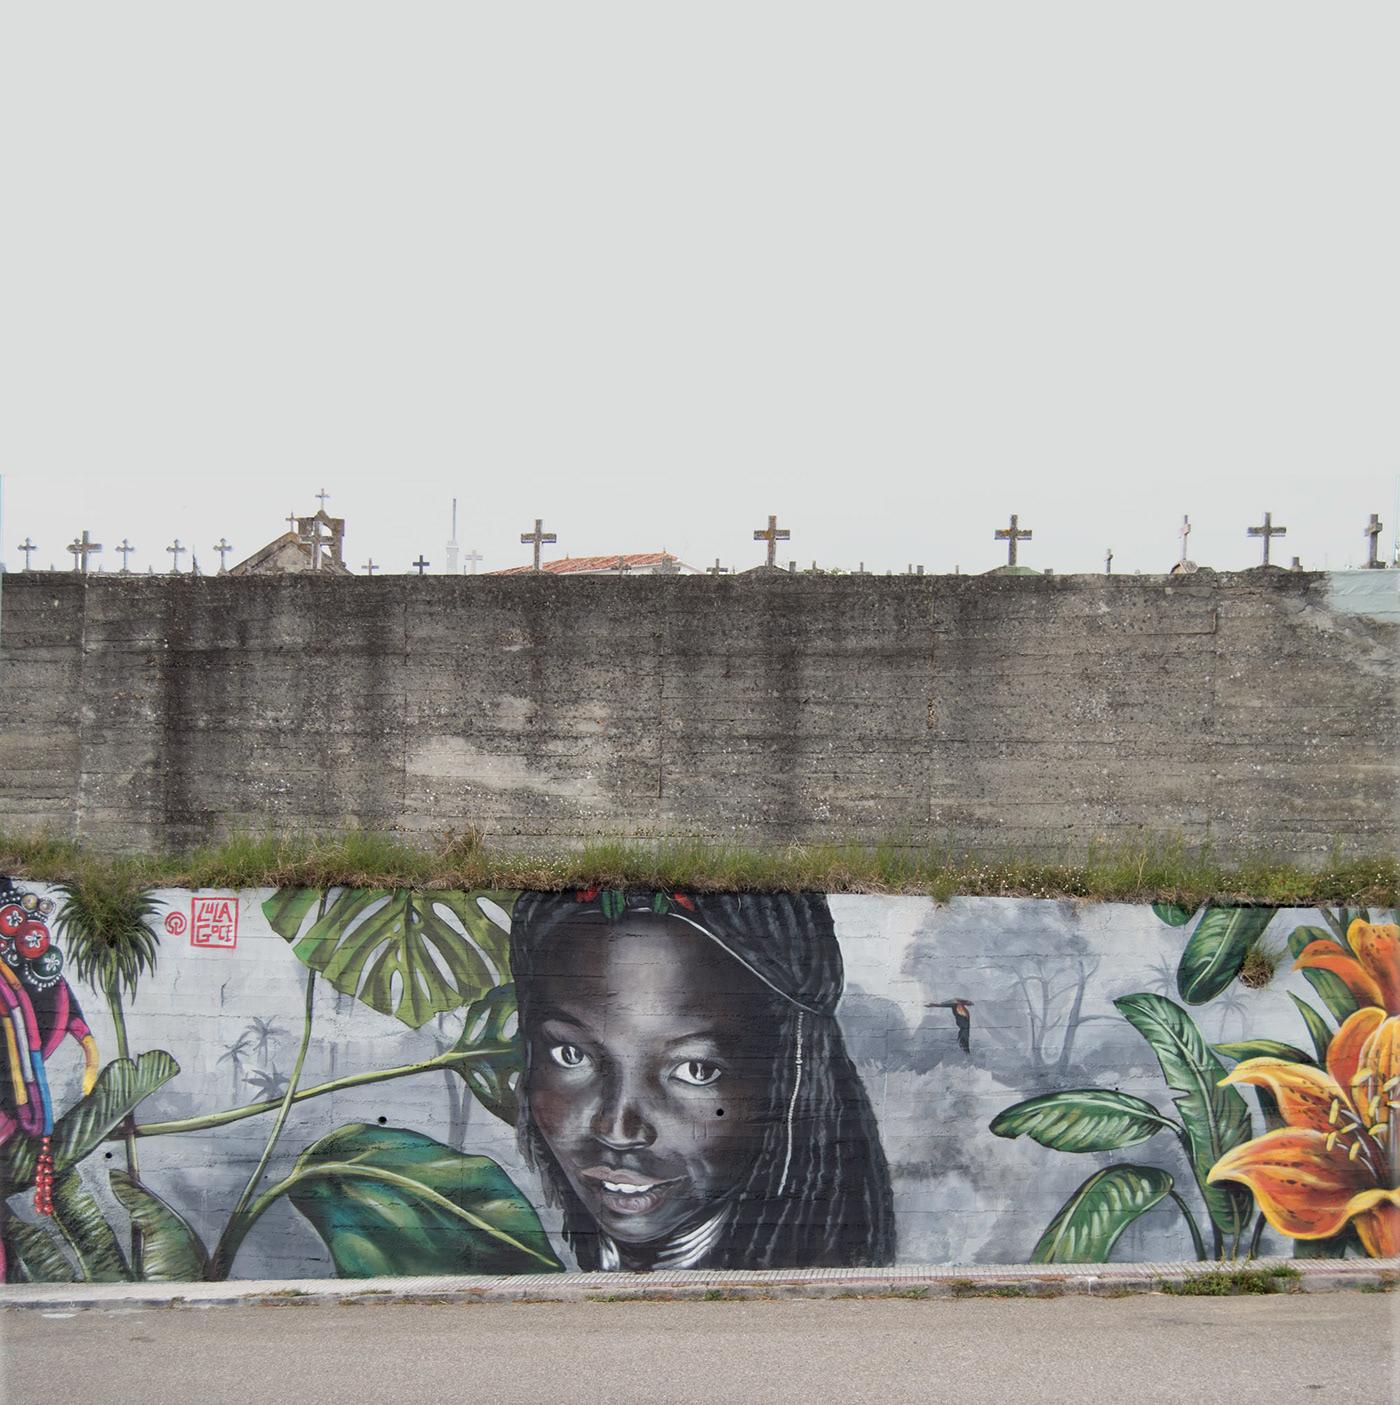 arte urbano fine art Graffiti Illustrator Lula Goce Mural streetart Urbanart